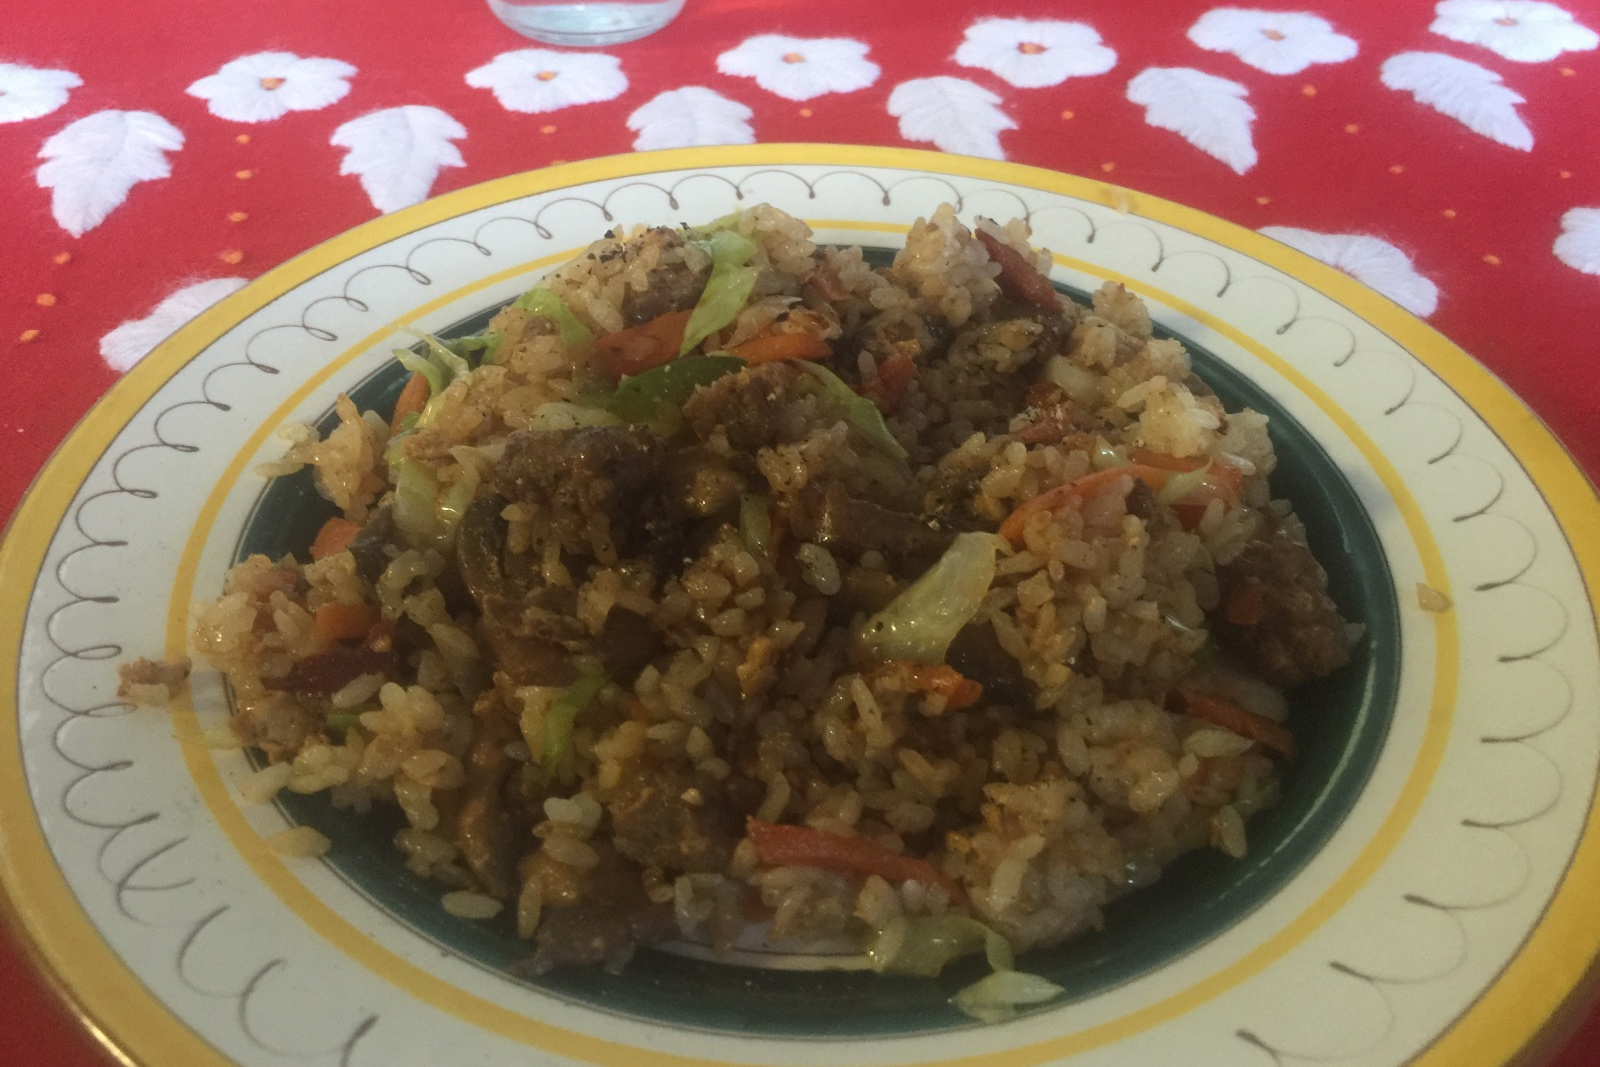 http://blog.rickk.com/food/2015/11/29/ate.2015.11.29.l.jpg